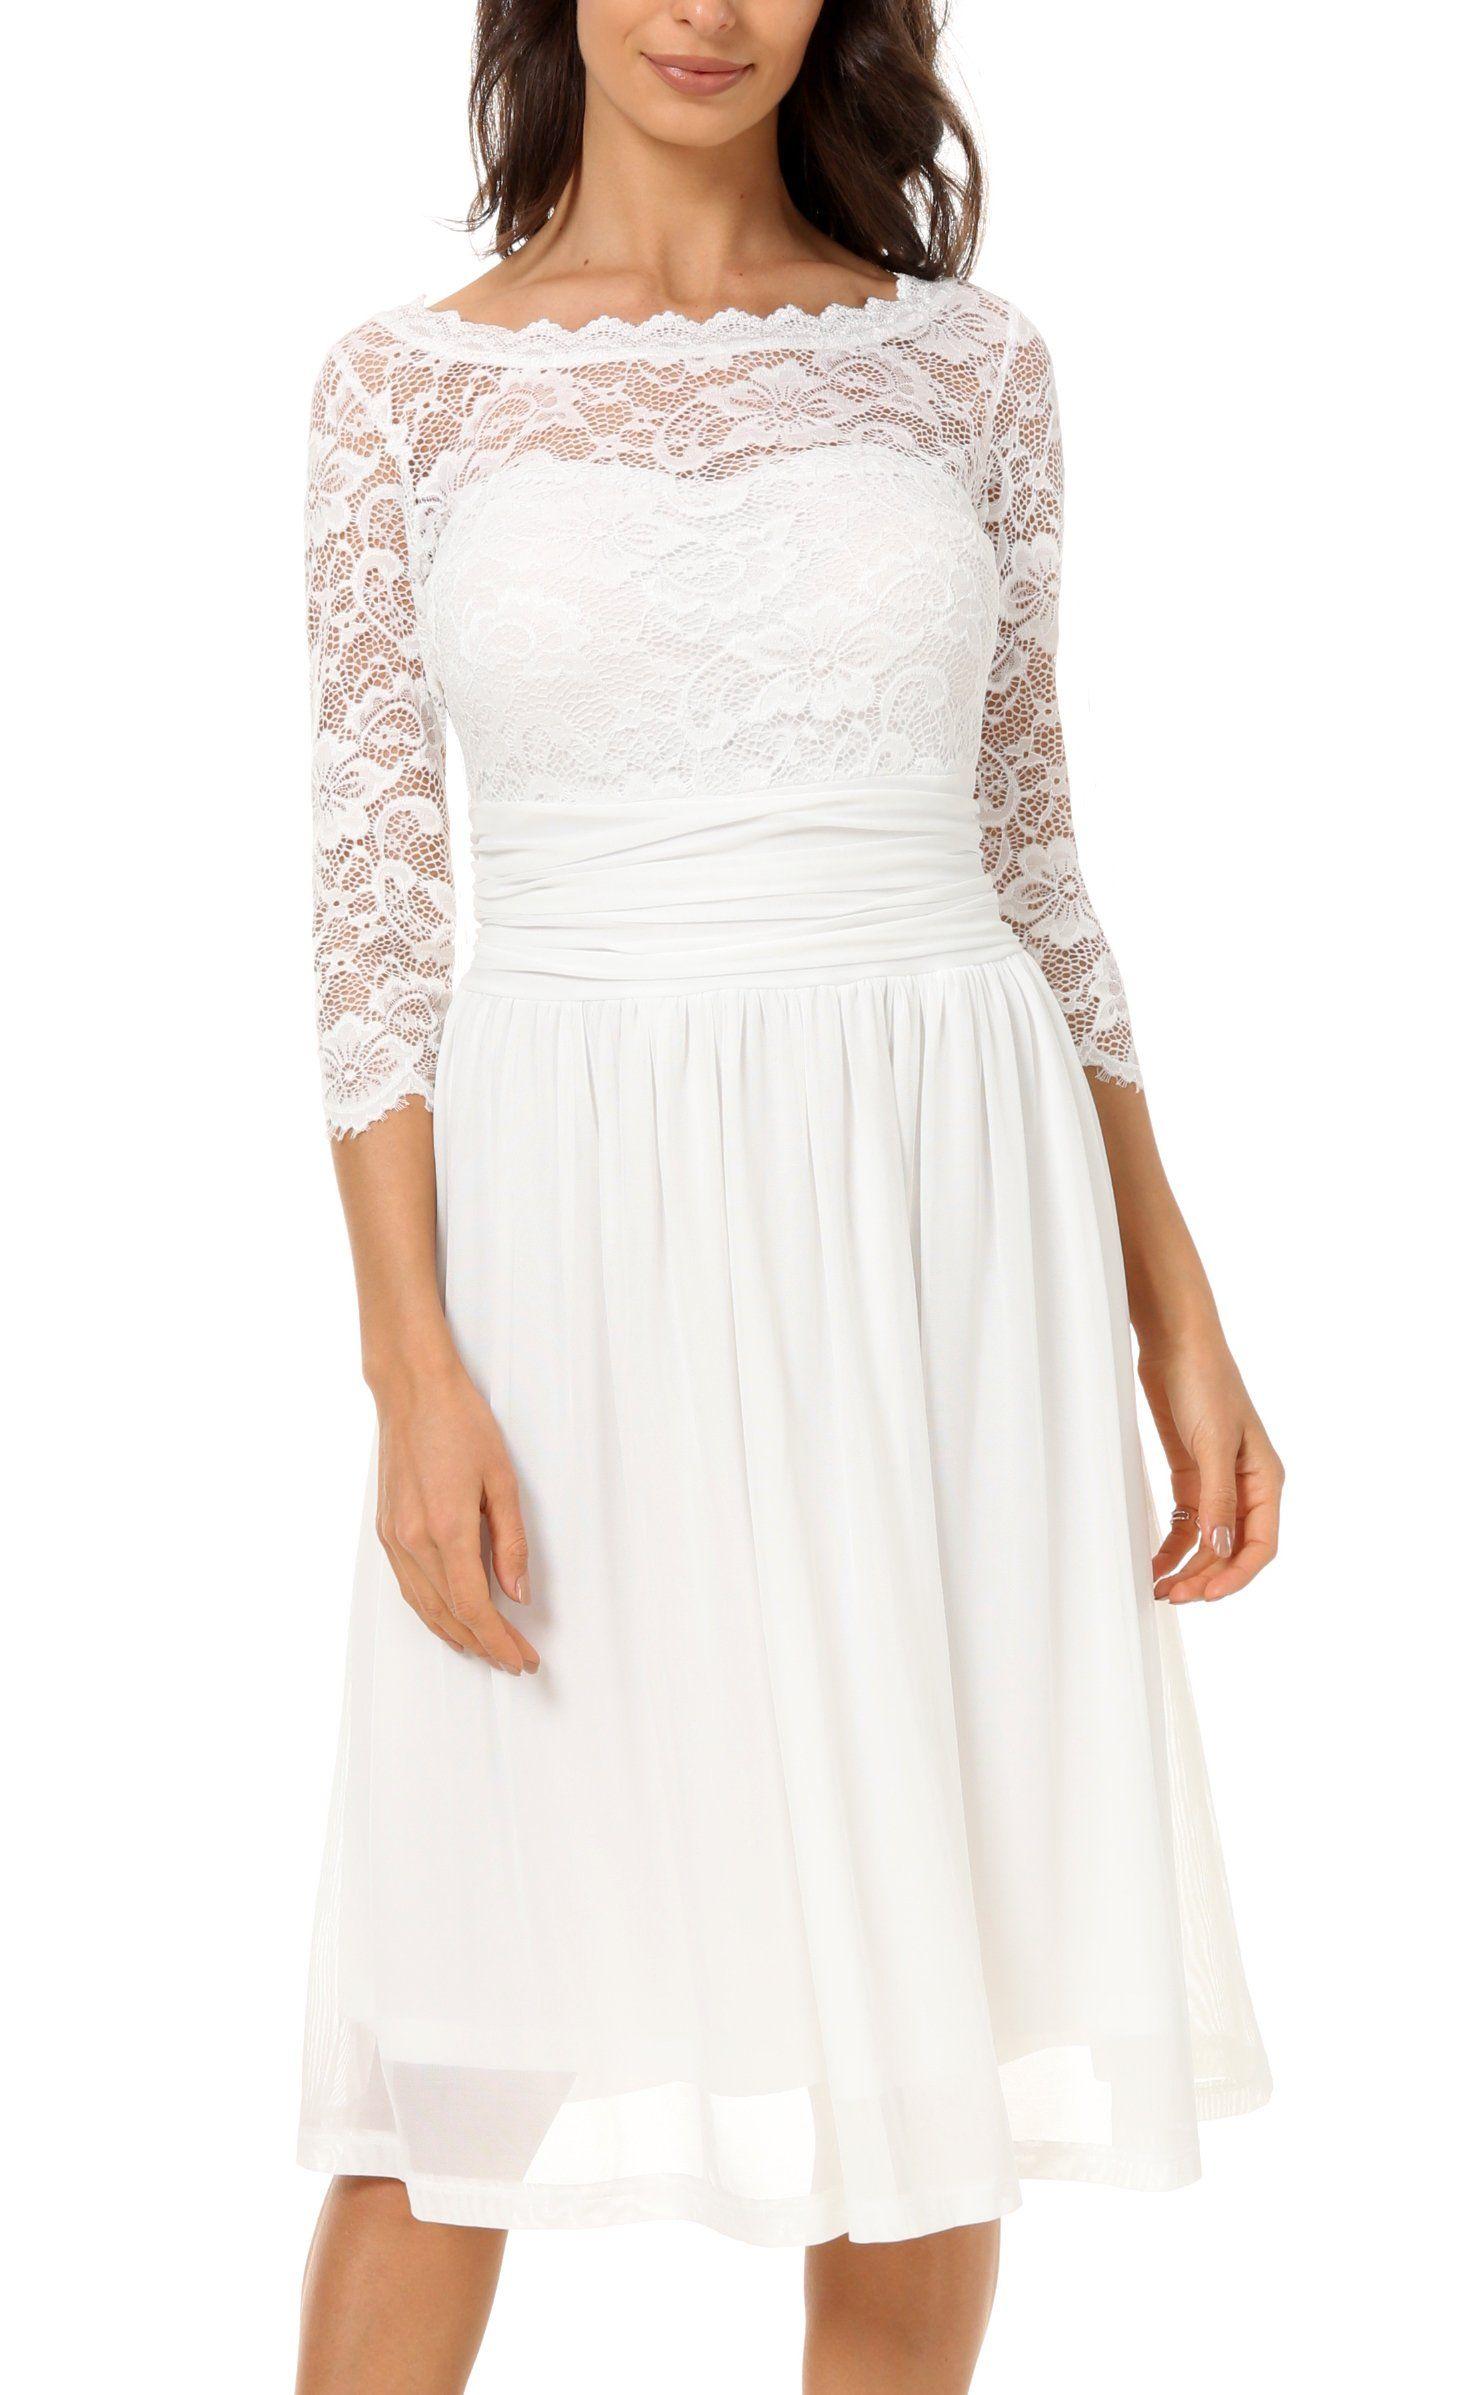 DILANNI Women's Vintage Formal Floral Lace 3/4 Sleeve